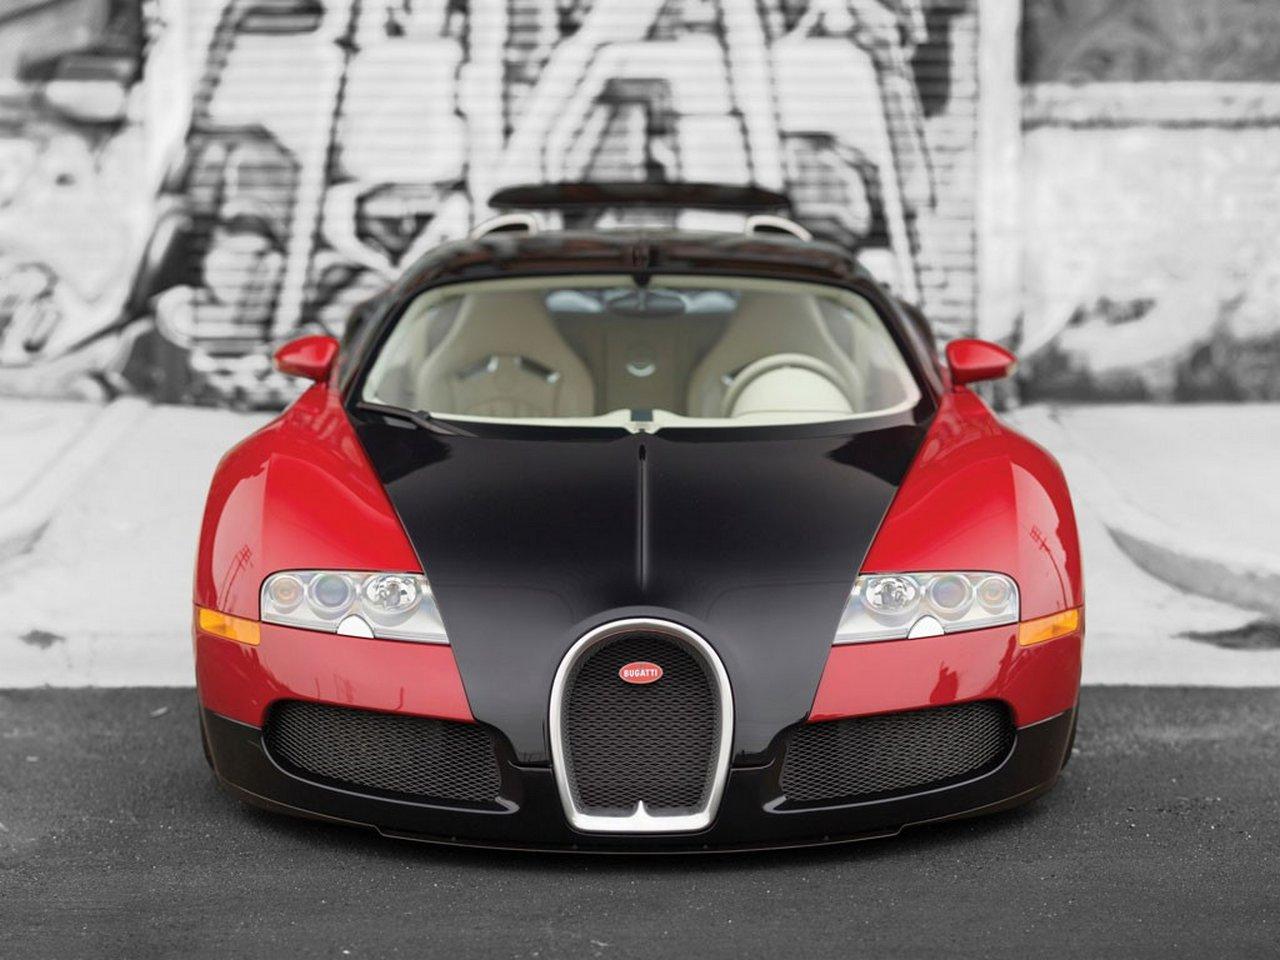 bugatti-veyron-001-2005-rm-auction-0-100-1